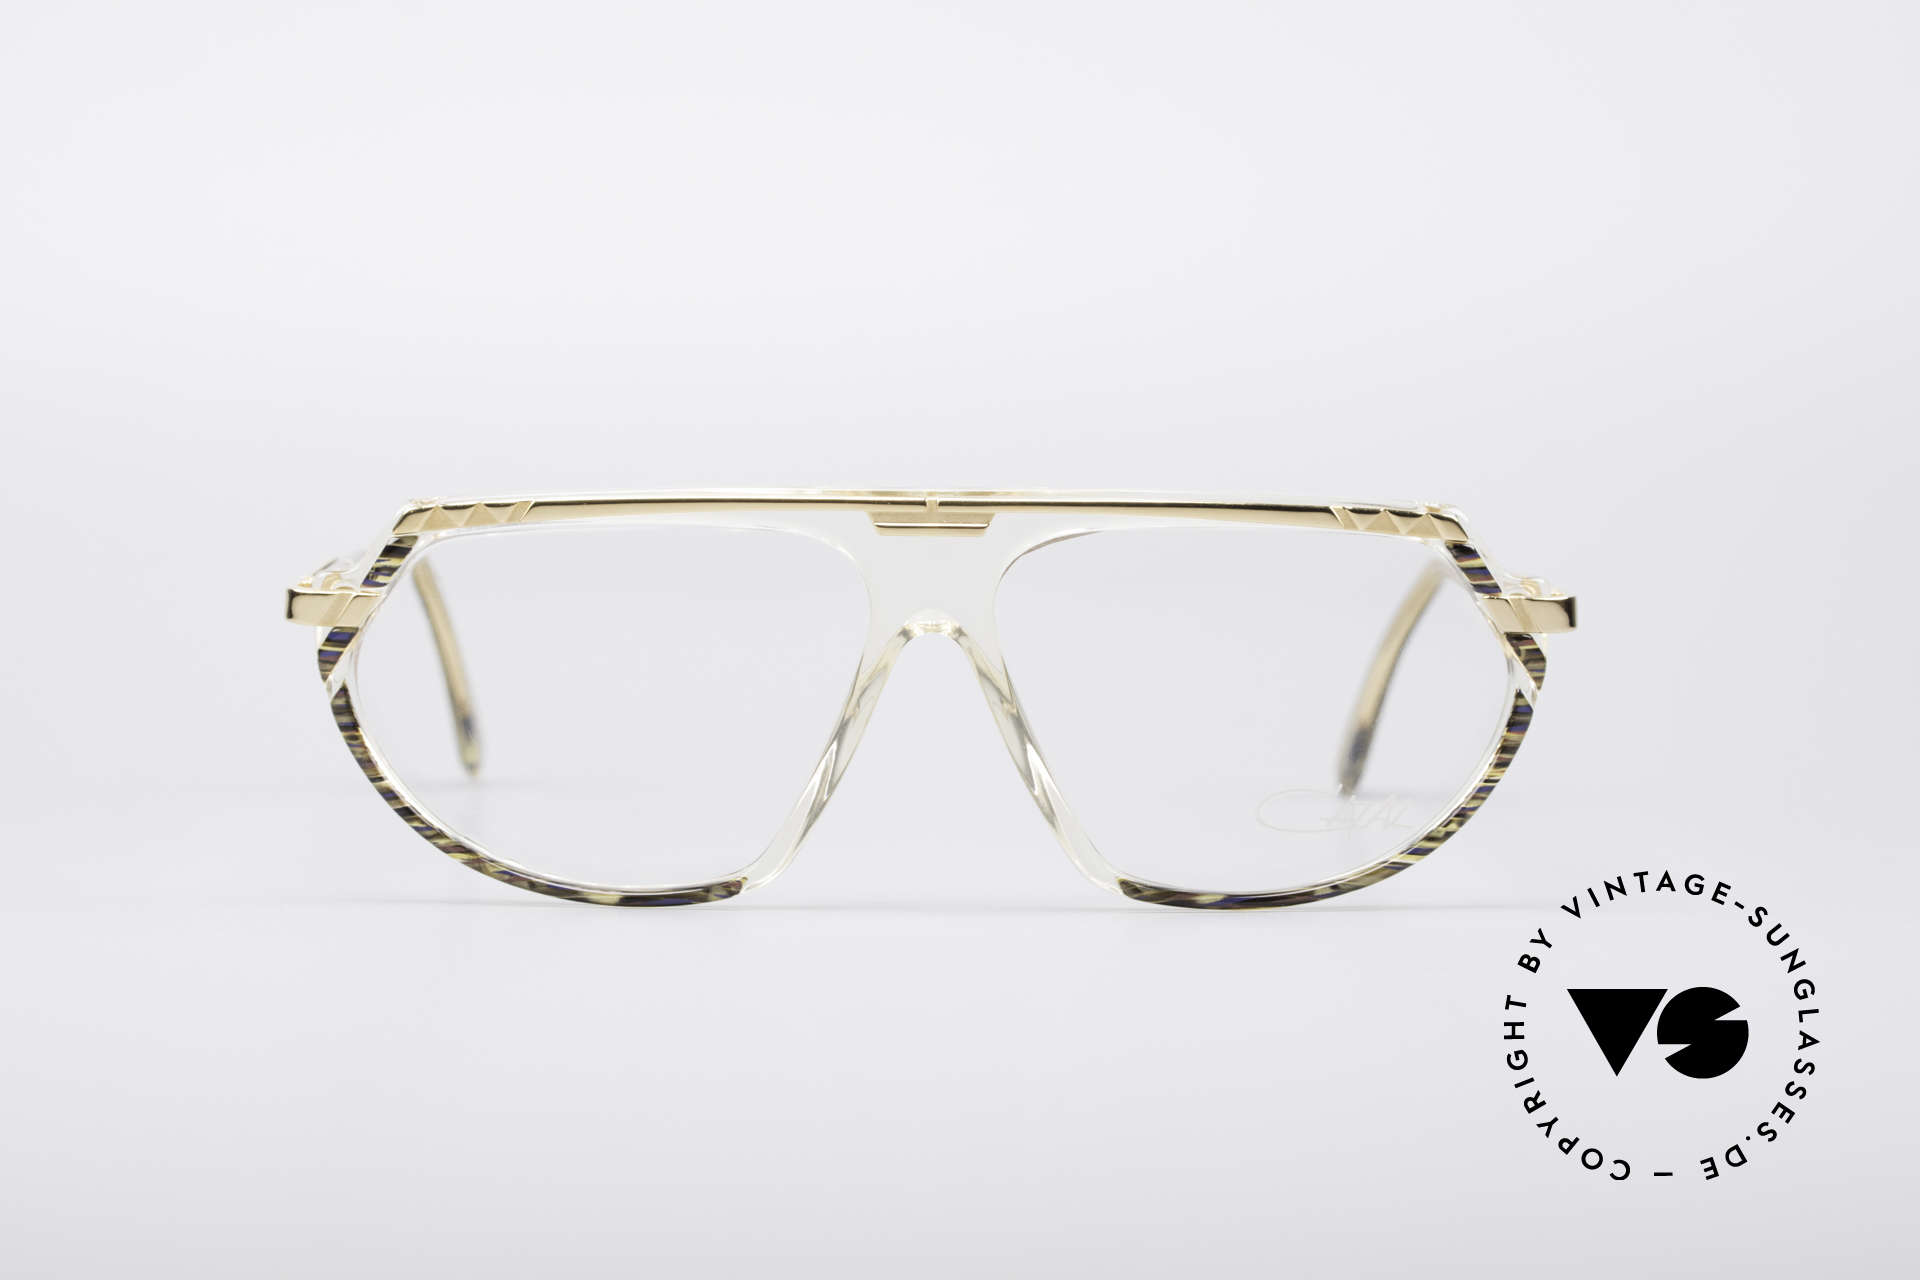 Cazal 344 Old School Crystal Glasses, vintage CAZAL designer eyeglasses from 1989/1990, Made for Women